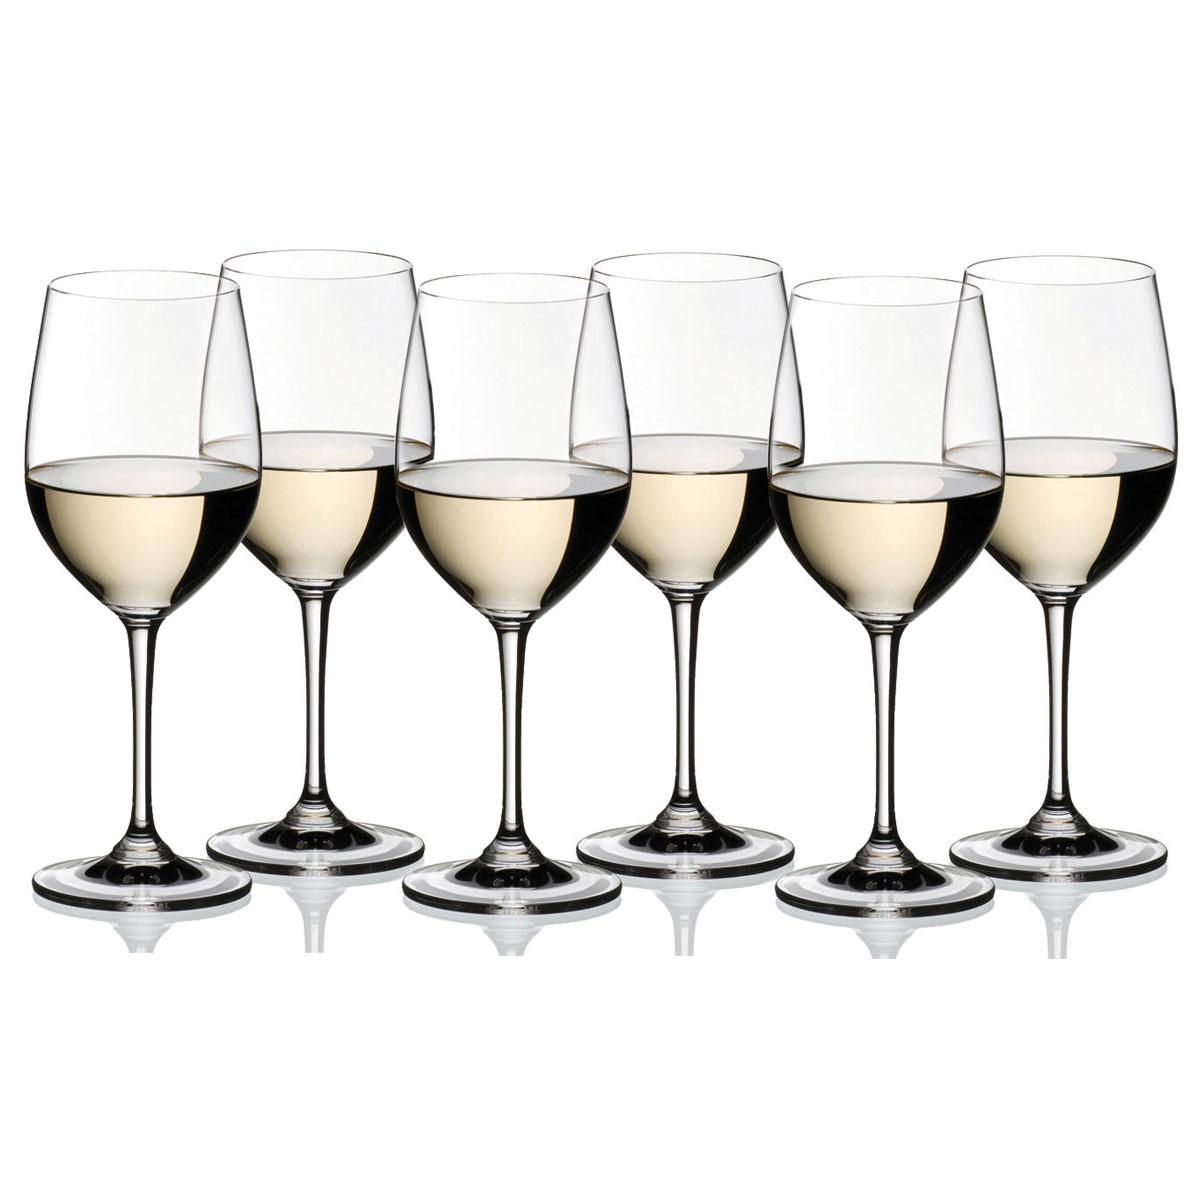 Riedel Vinum Chardonnay, Viognier, Set of 6